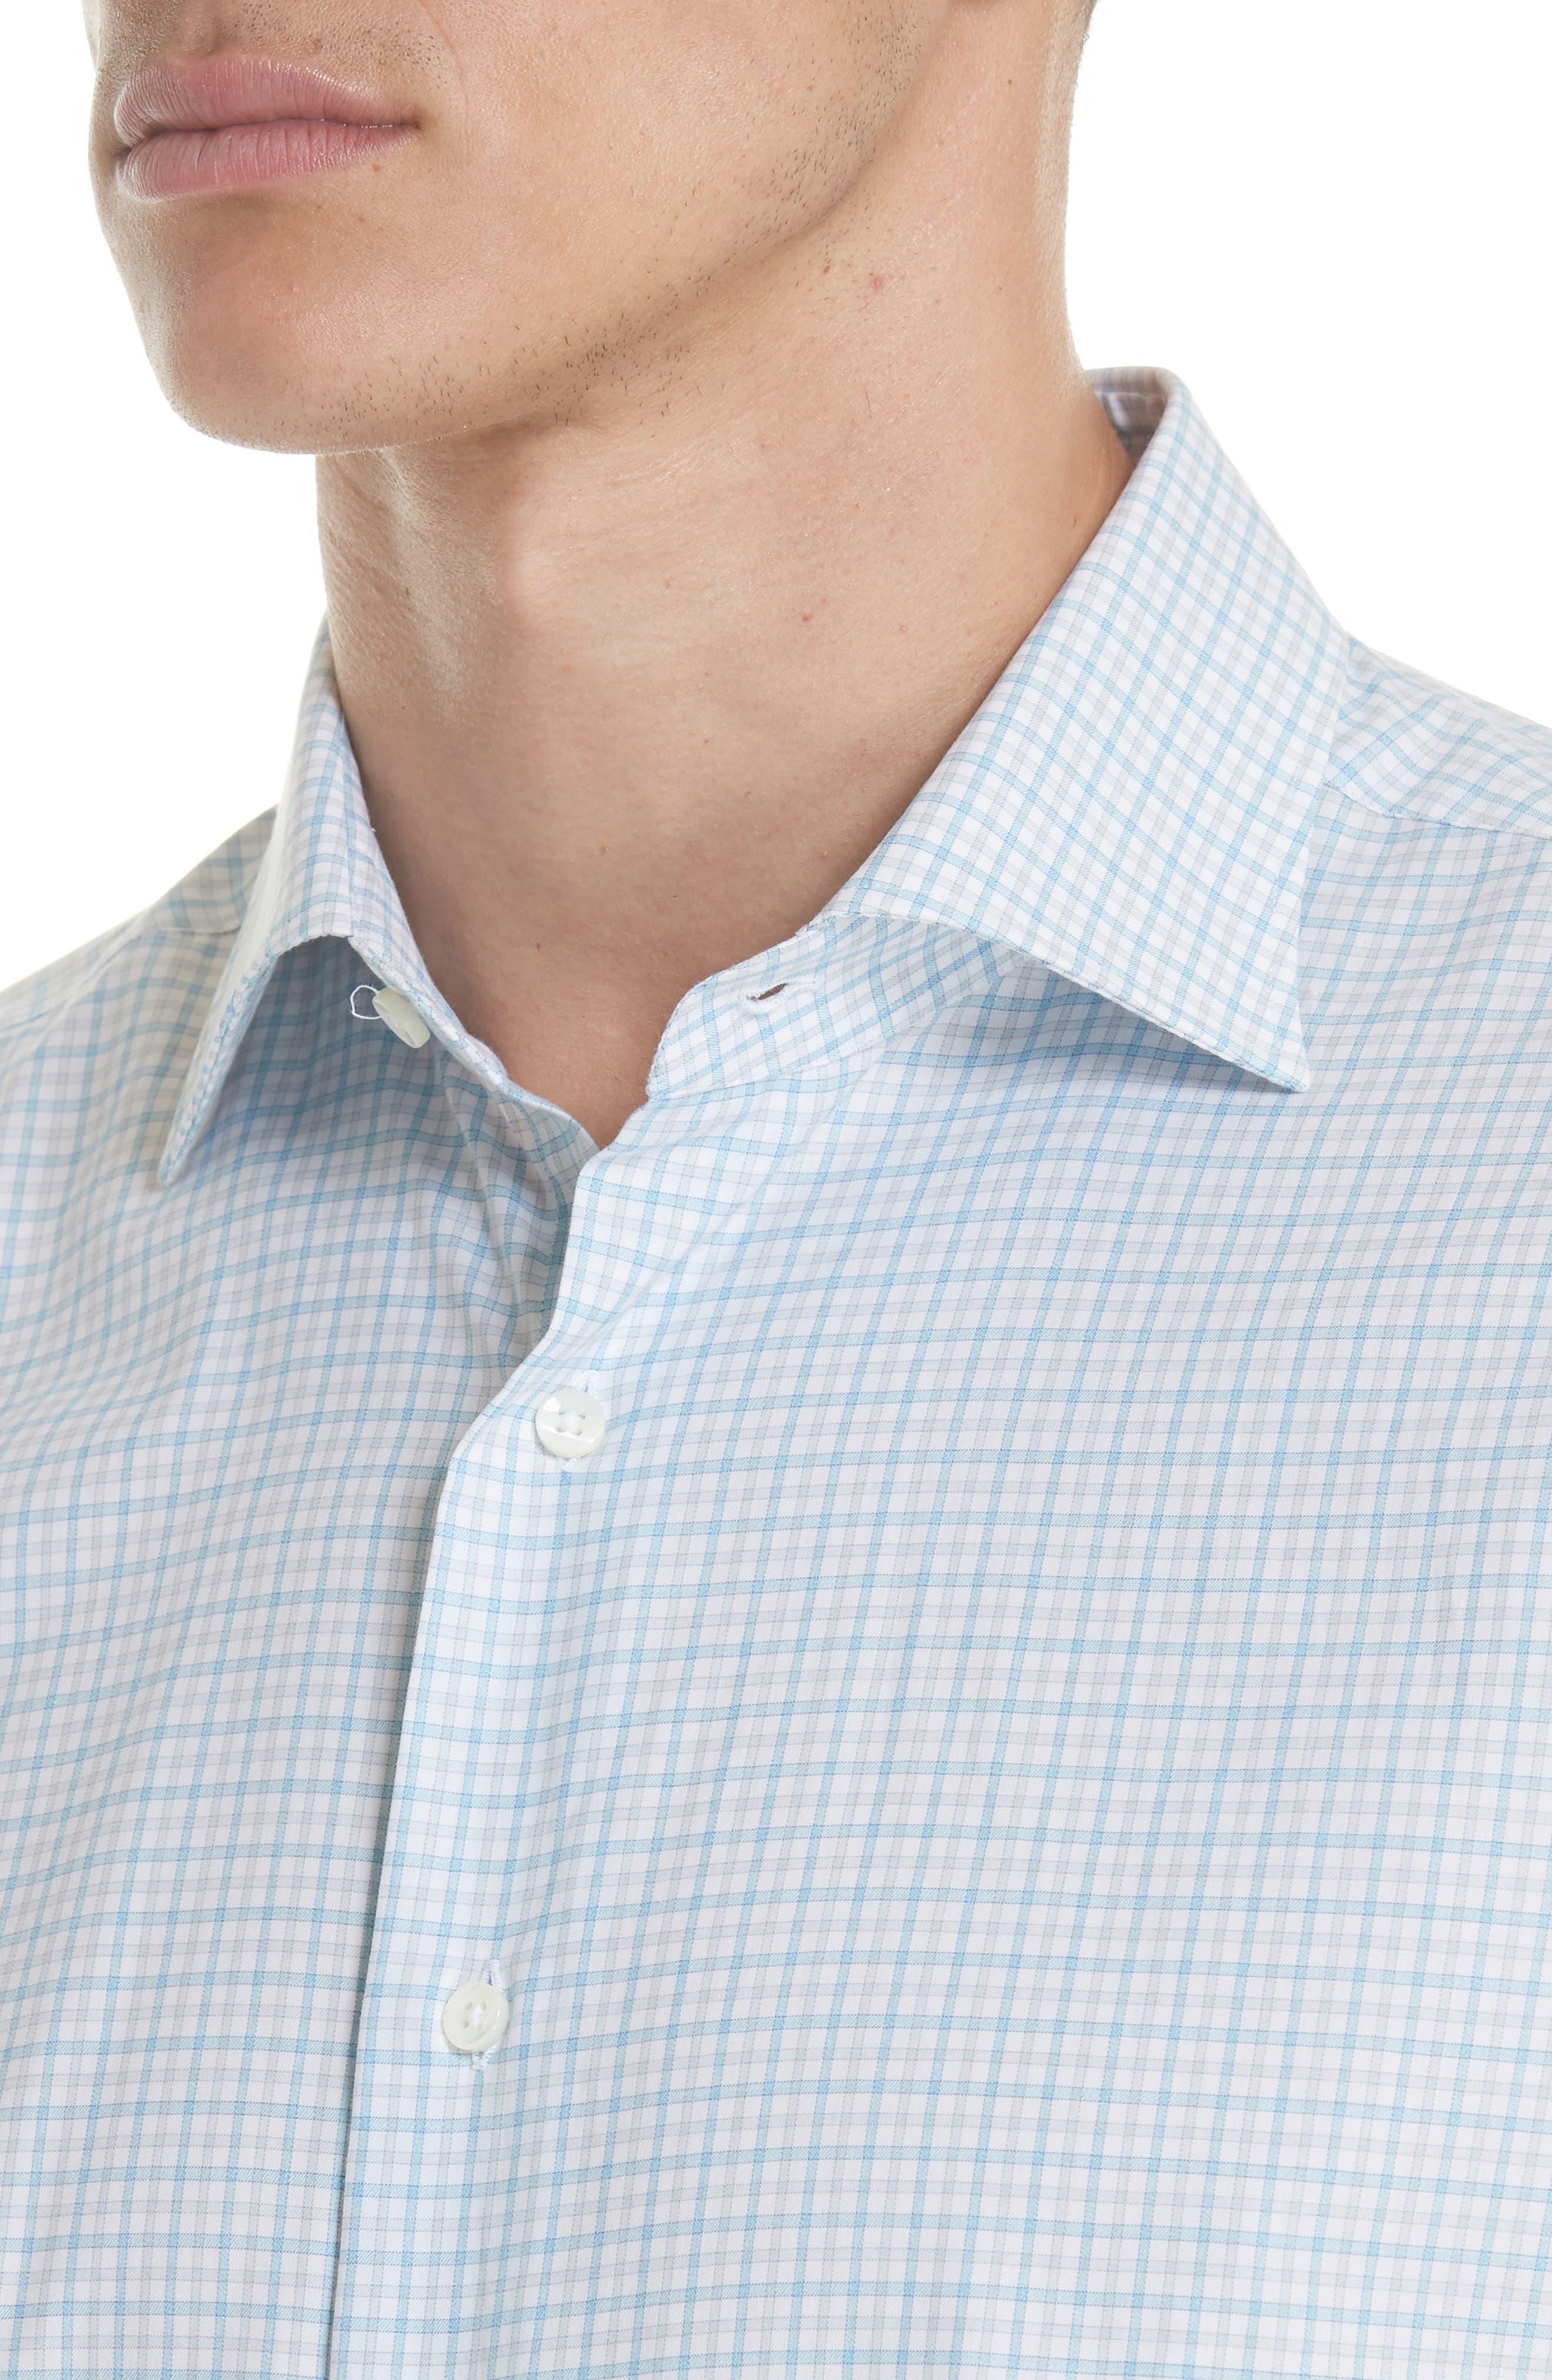 Regular Fit Check Dress Shirt,                             Alternate thumbnail 2, color,                             Turquoise